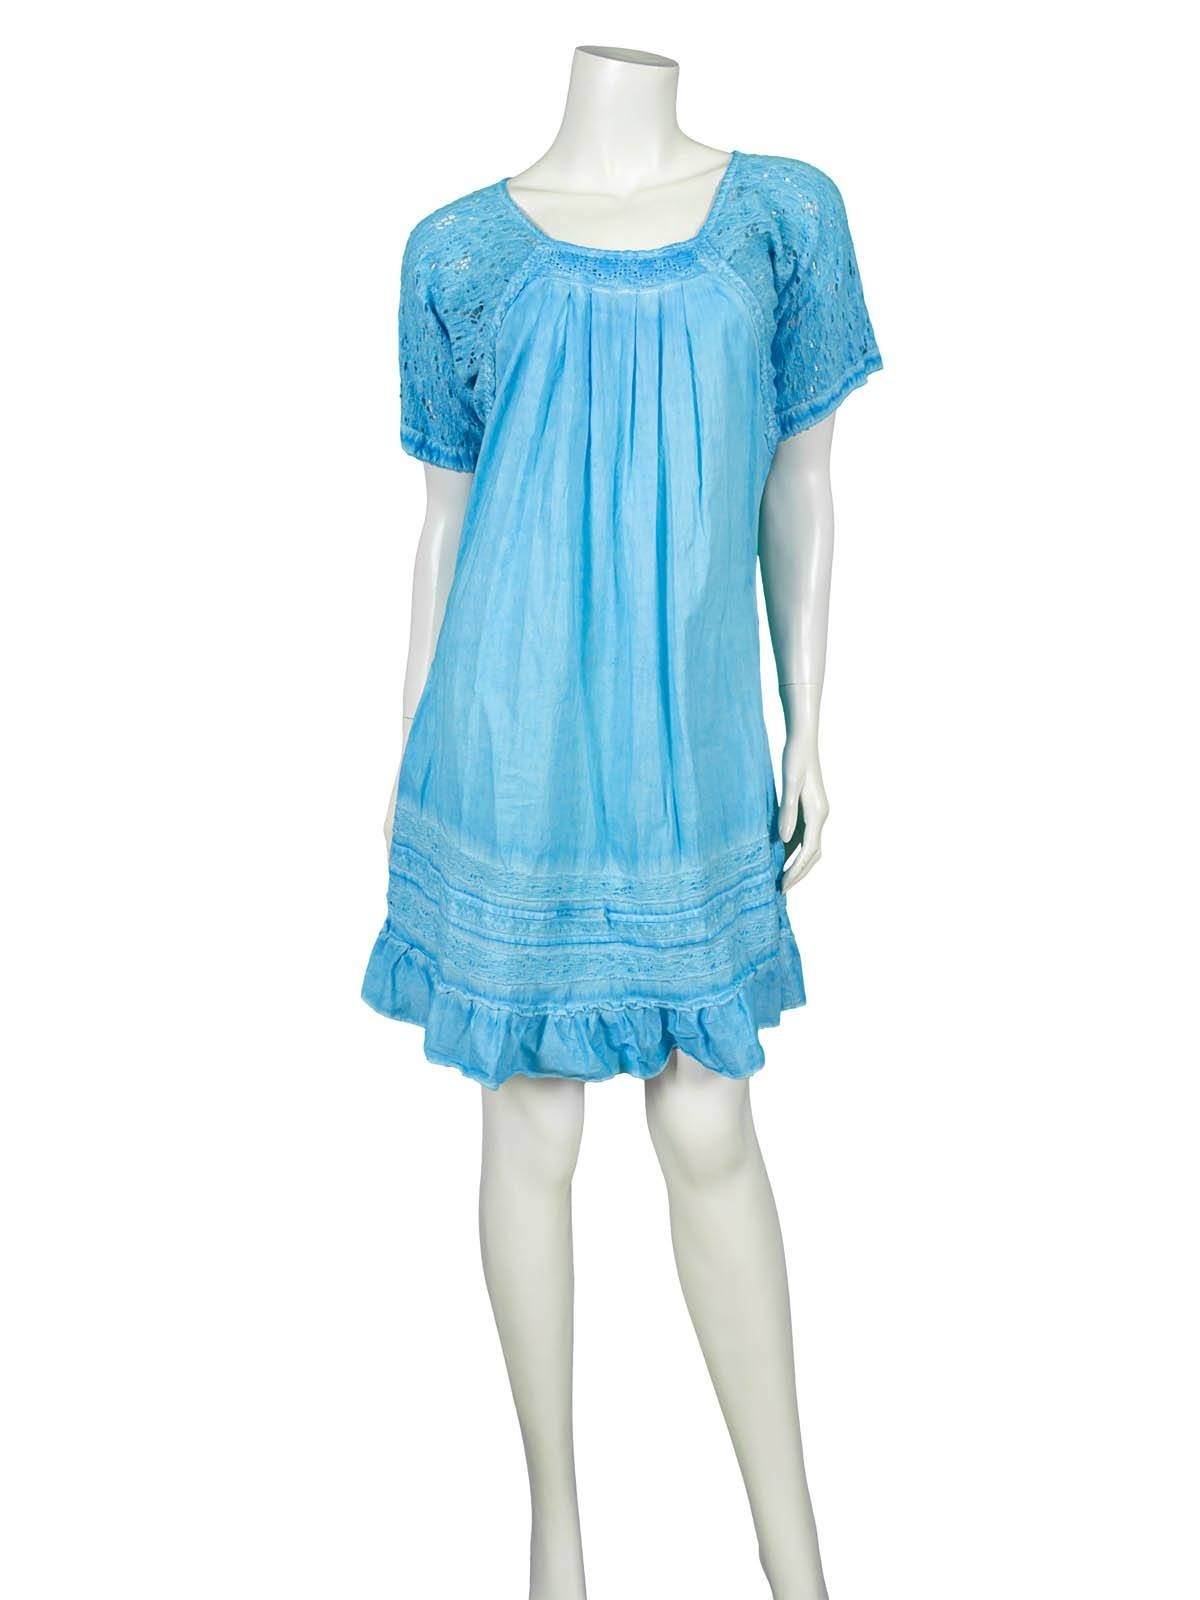 17 Kreativ Kleid Türkis Spitze Vertrieb10 Erstaunlich Kleid Türkis Spitze Bester Preis